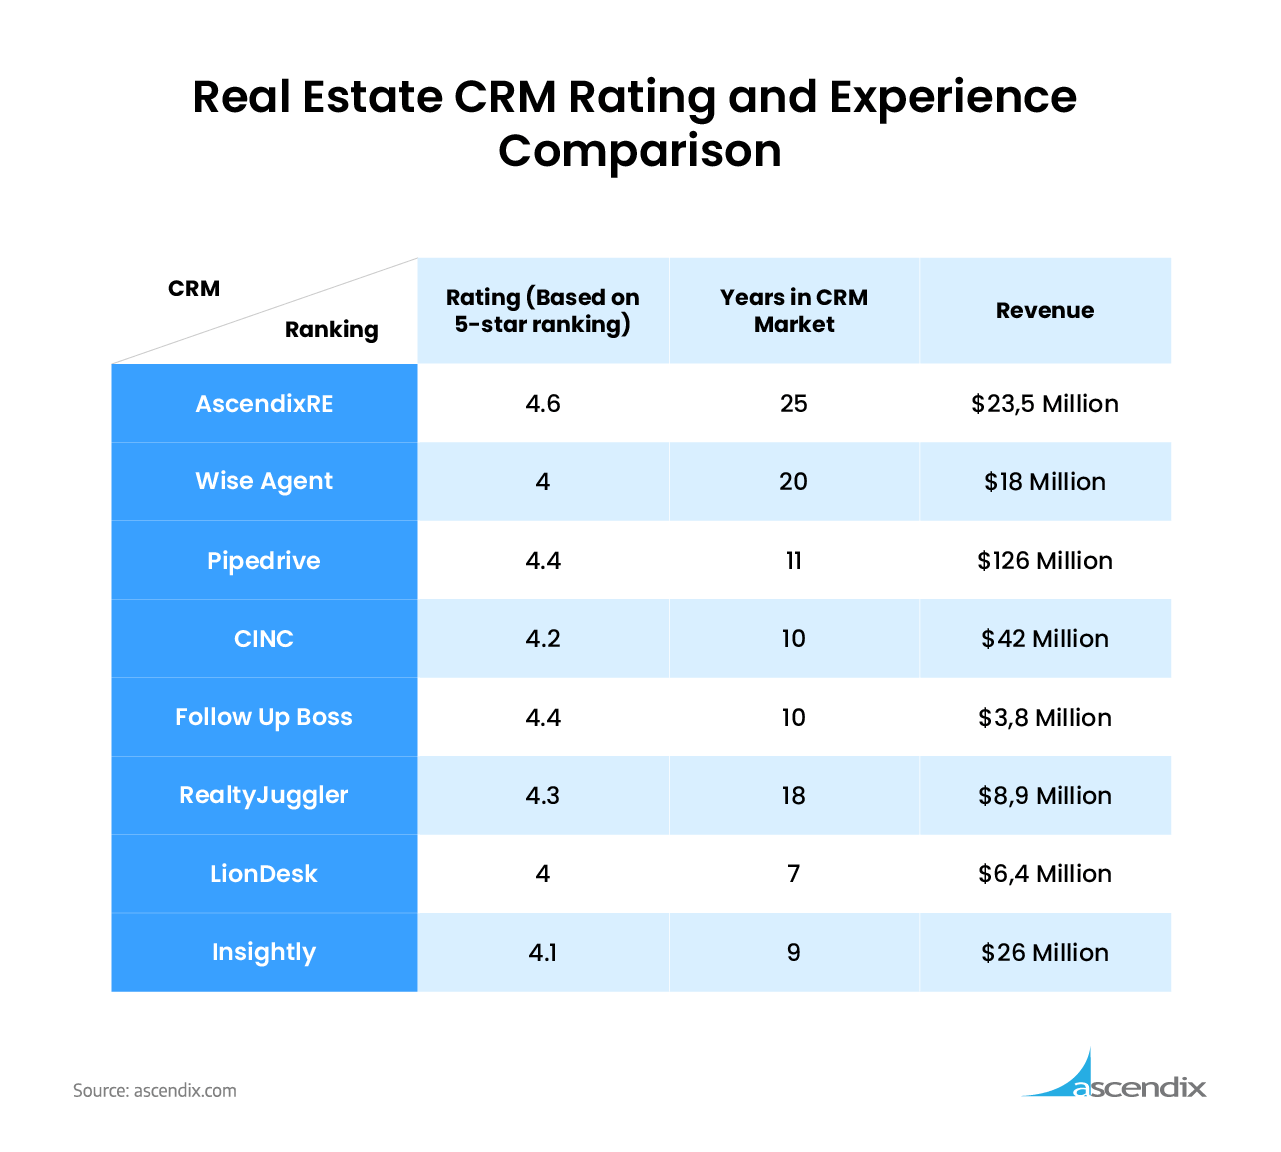 Real-Estate-CRM-Rating-Comparison